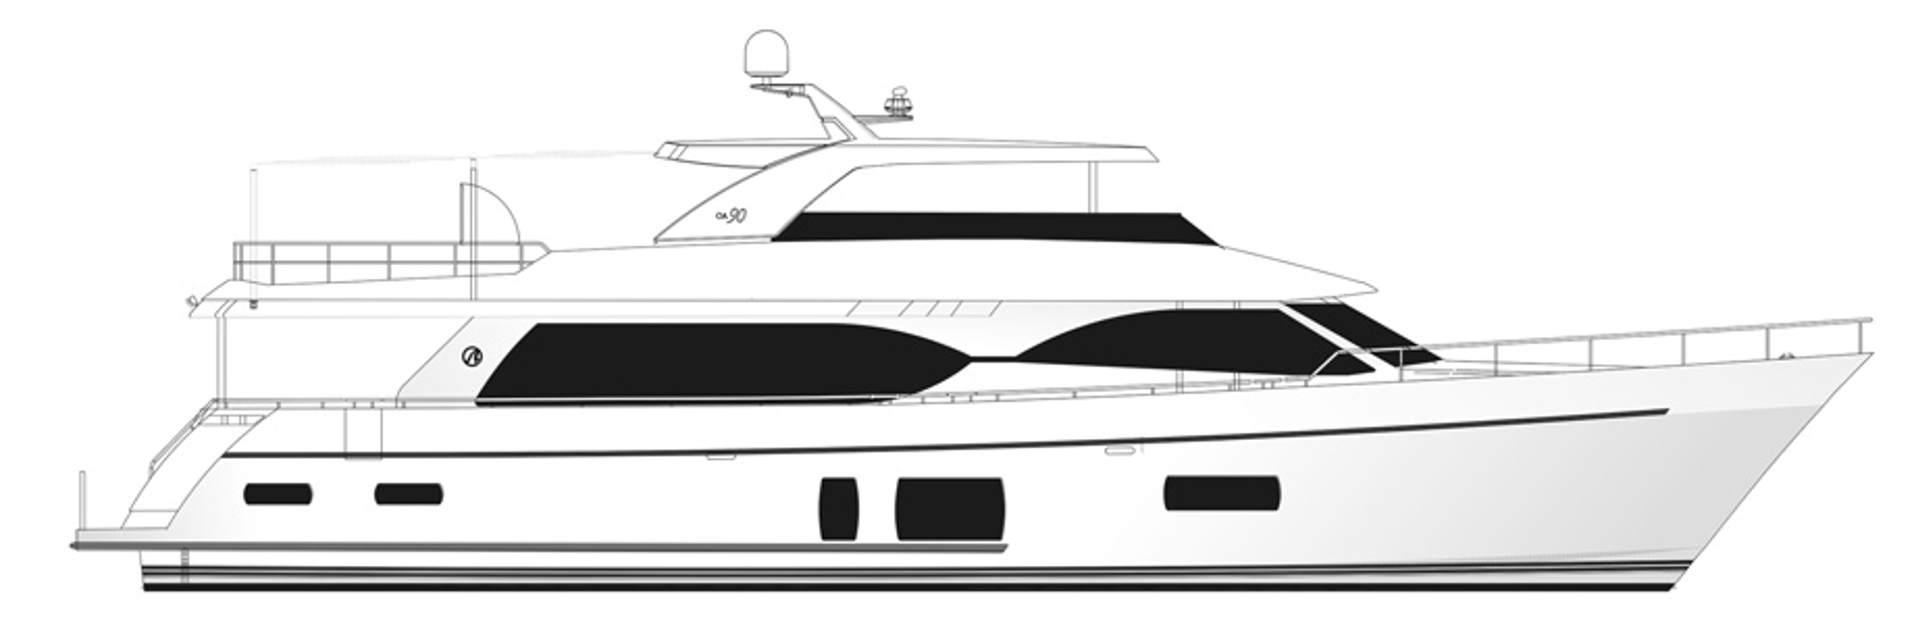 90 Flybridge Yacht Charter